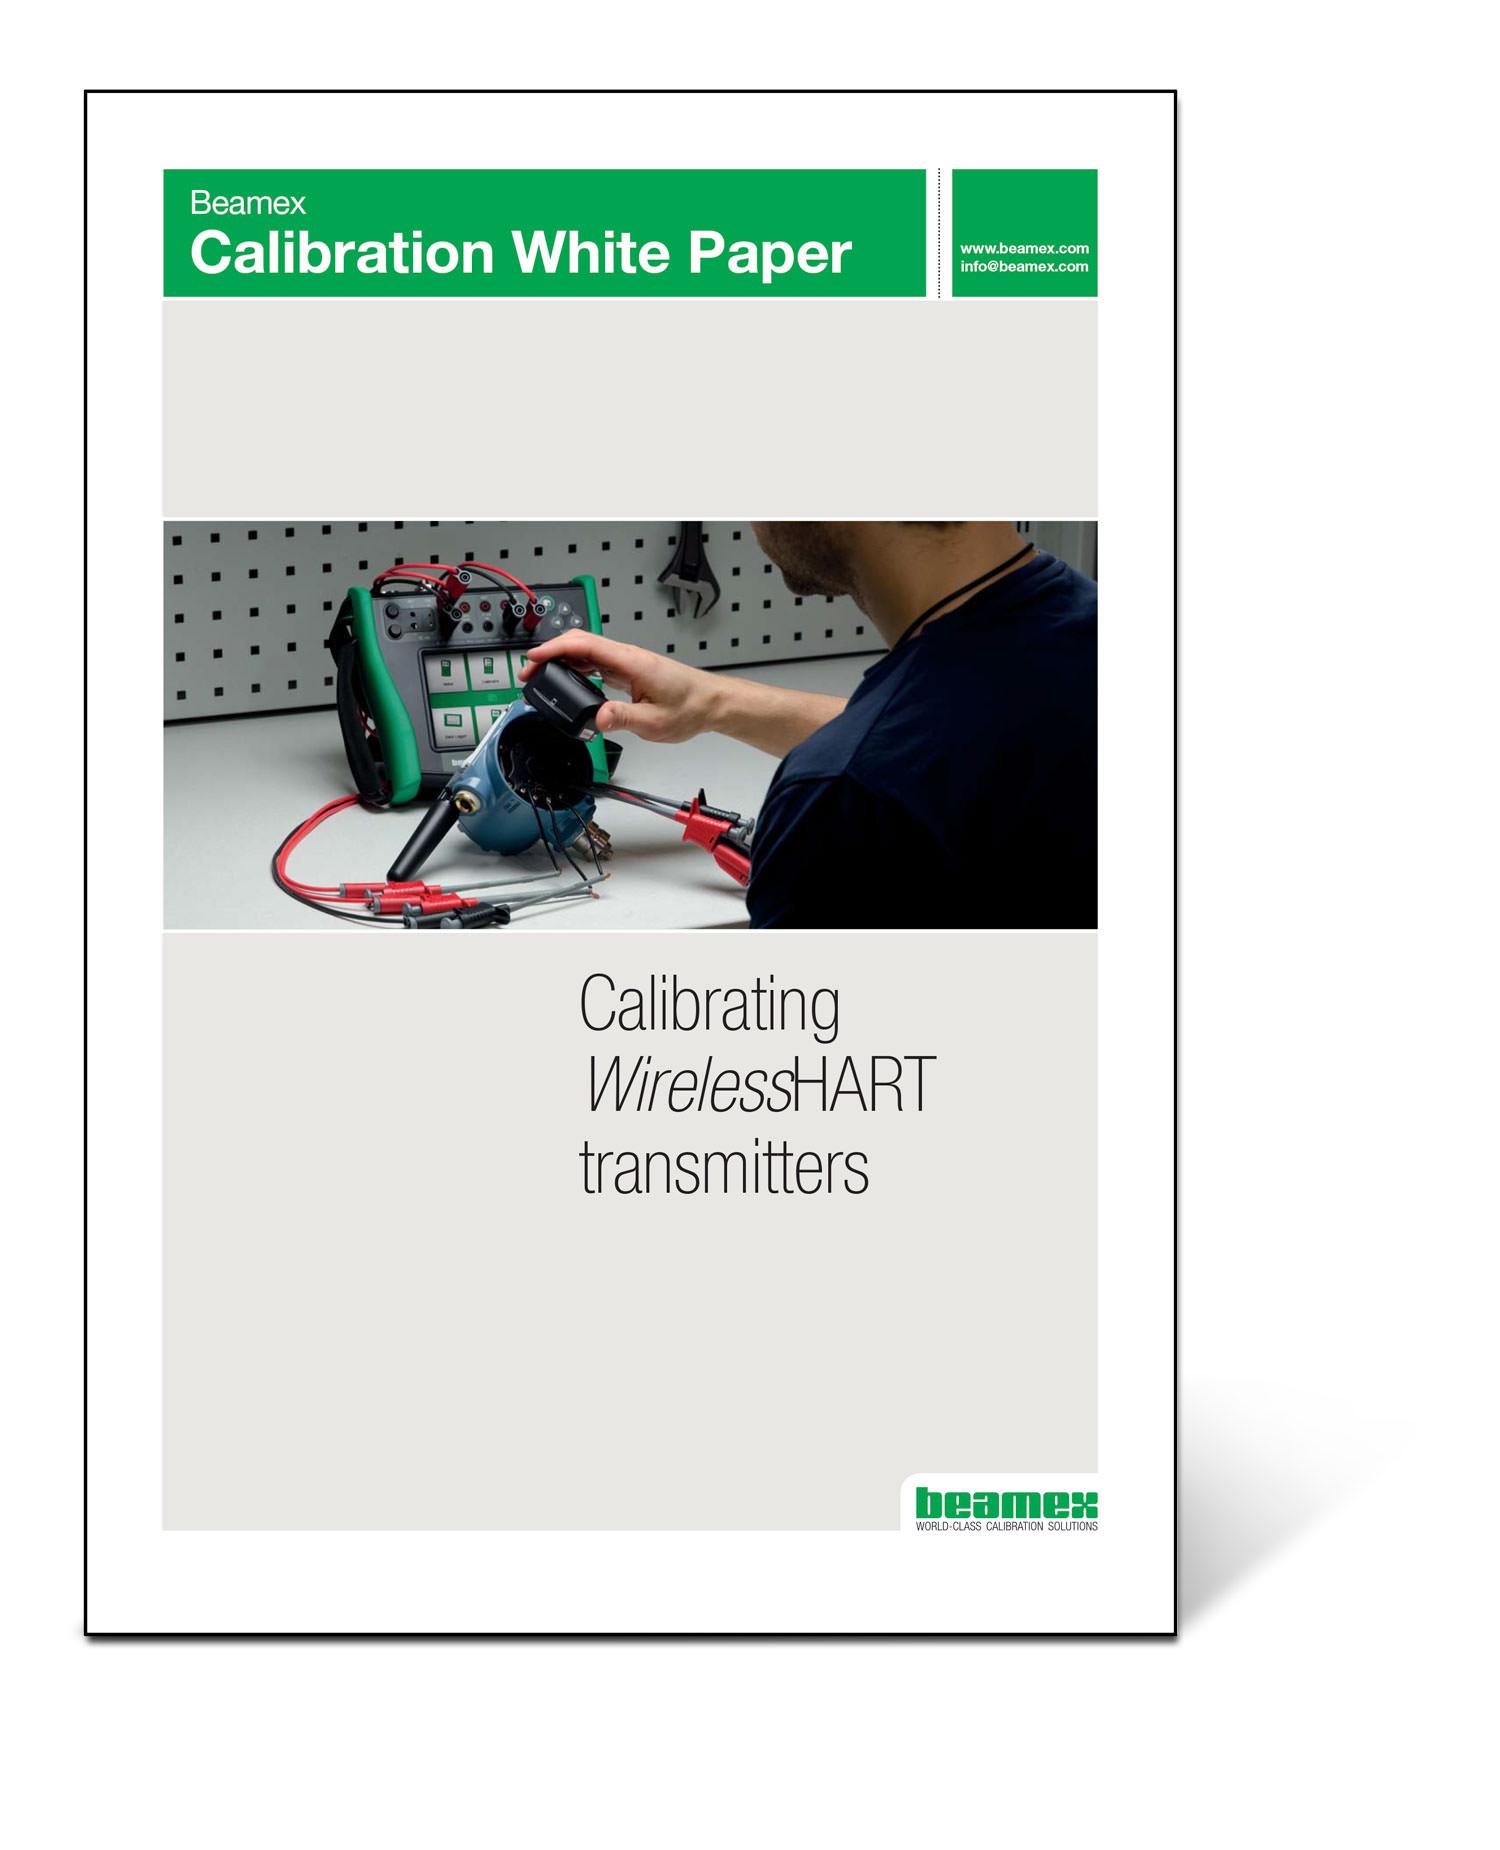 Calibrating wireless HART transmitters - Beamex white paper